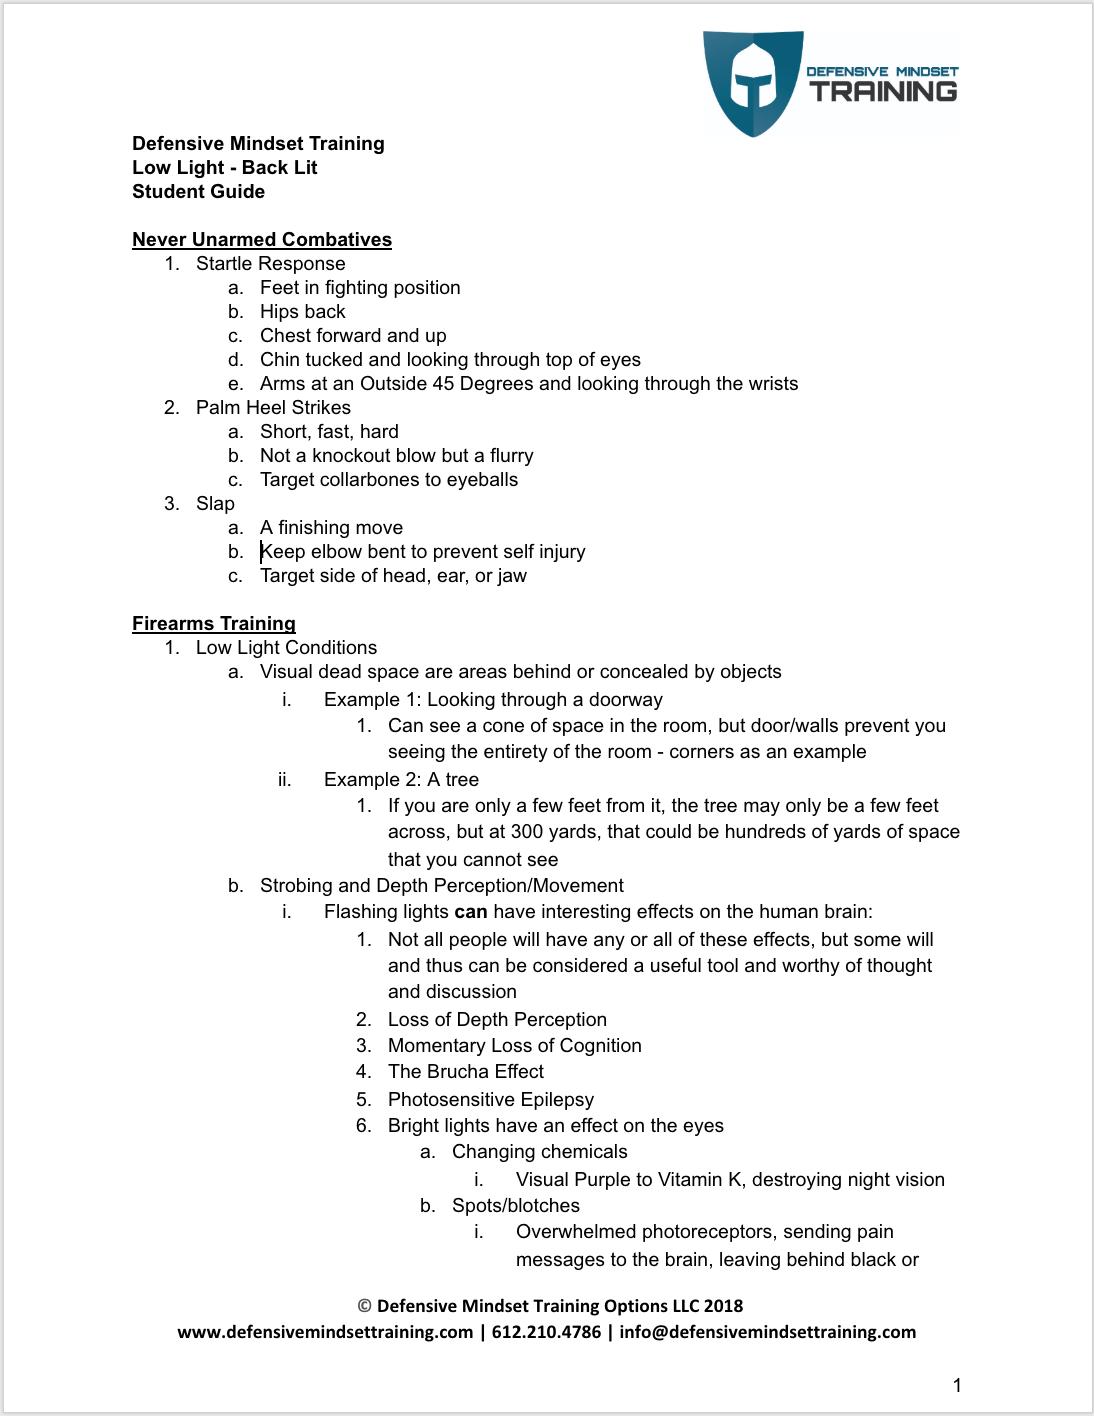 Low Light - Back Lit - Student Guide p 1